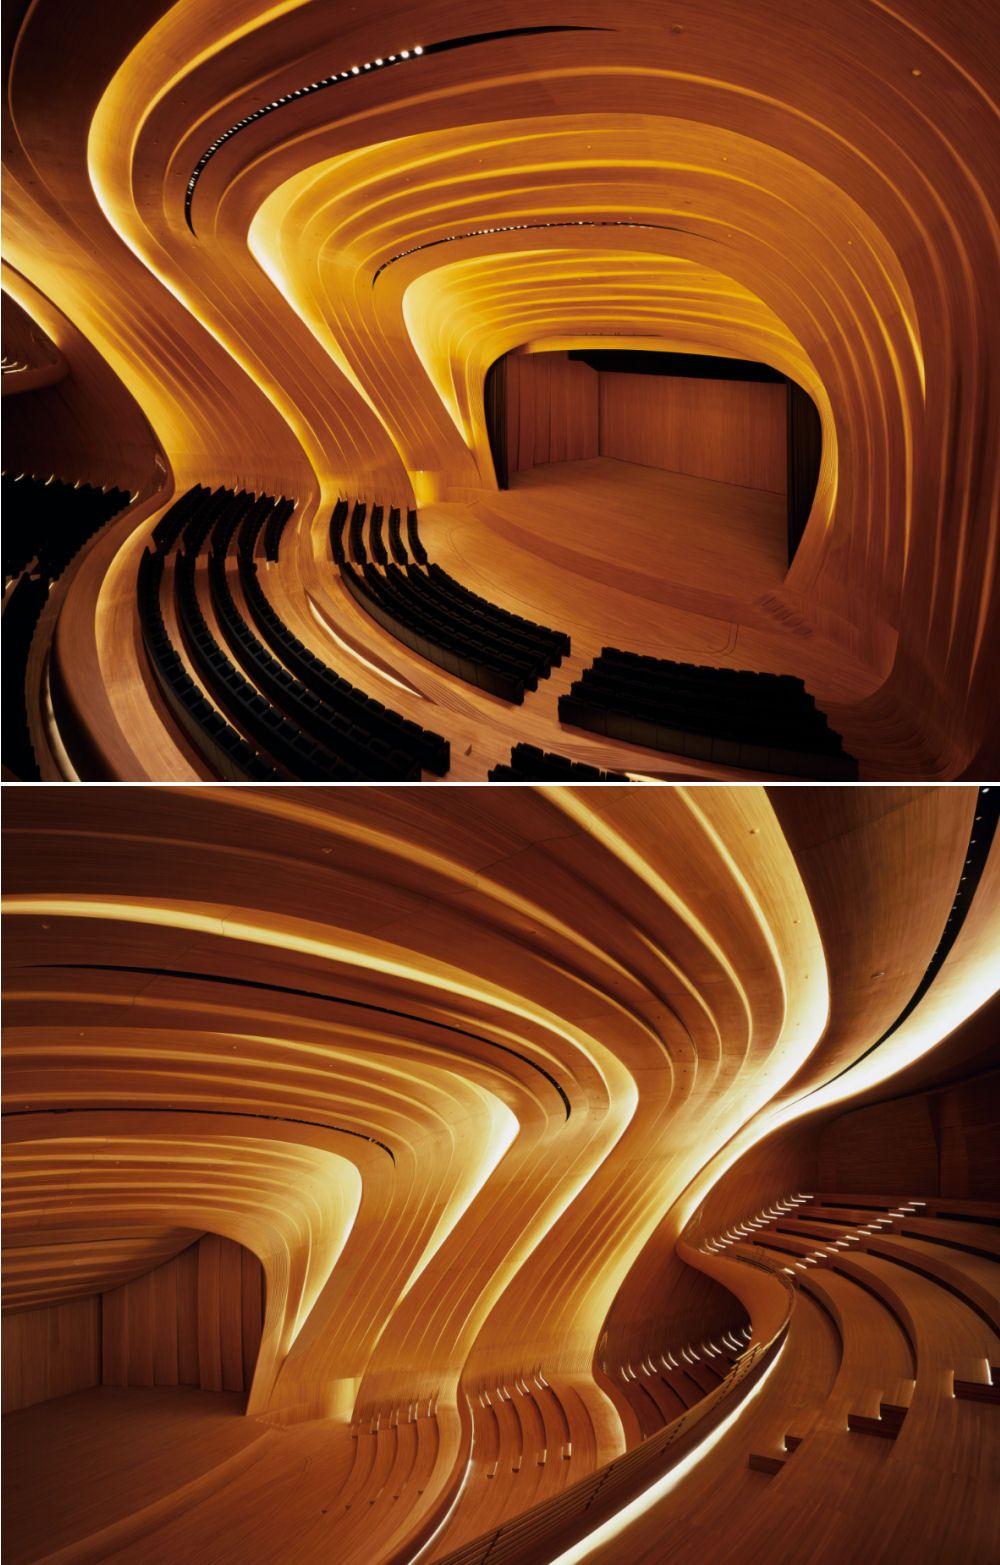 Heydar Aliyev Center By Zaha Hadid Architects (Baku, Azerbaijan) Contains A  Multipurpose Culture